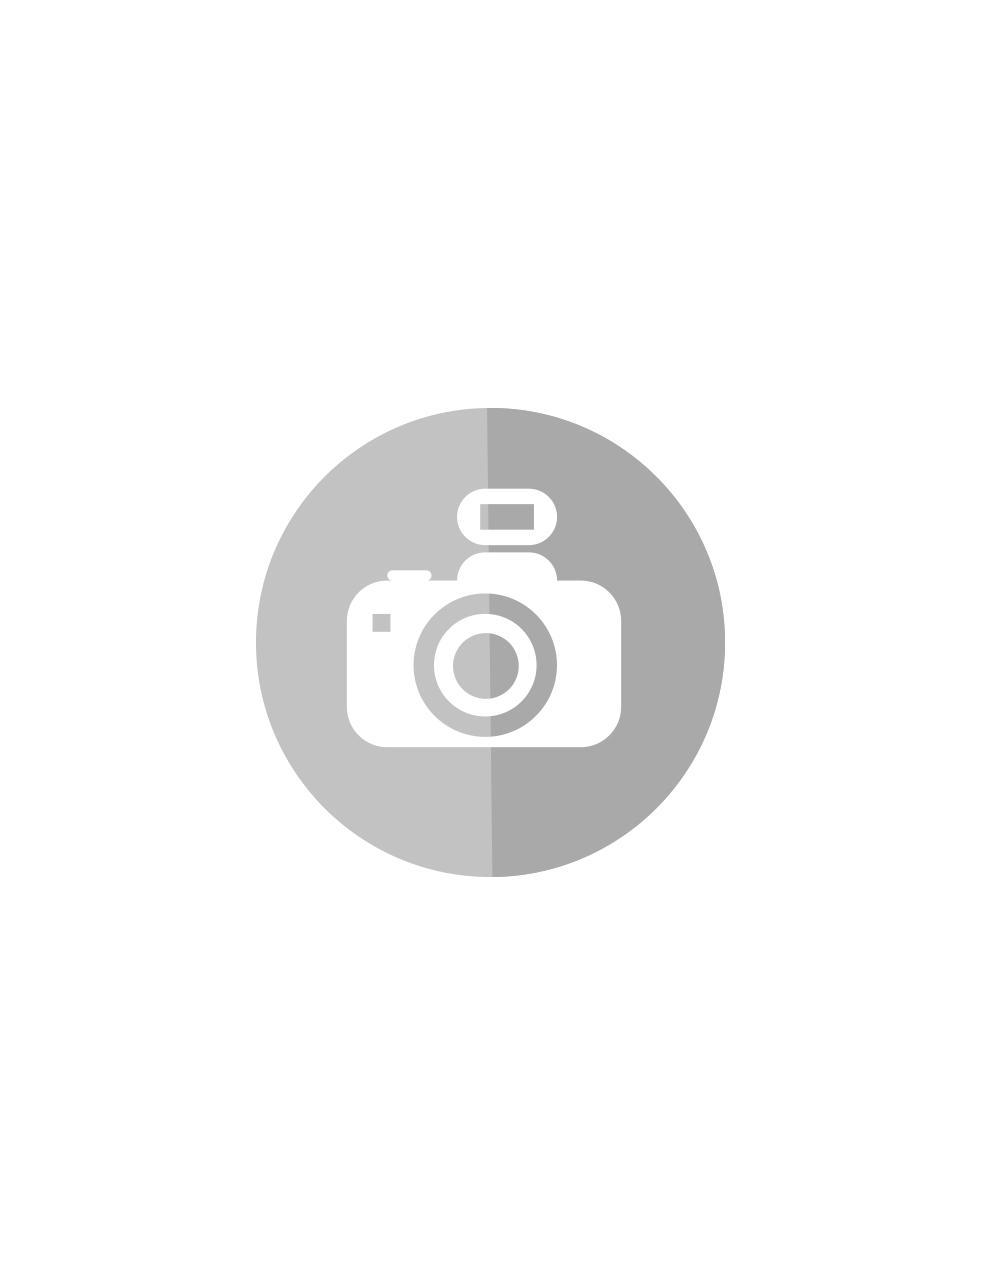 30098302_sparepart/Tablett 33/23